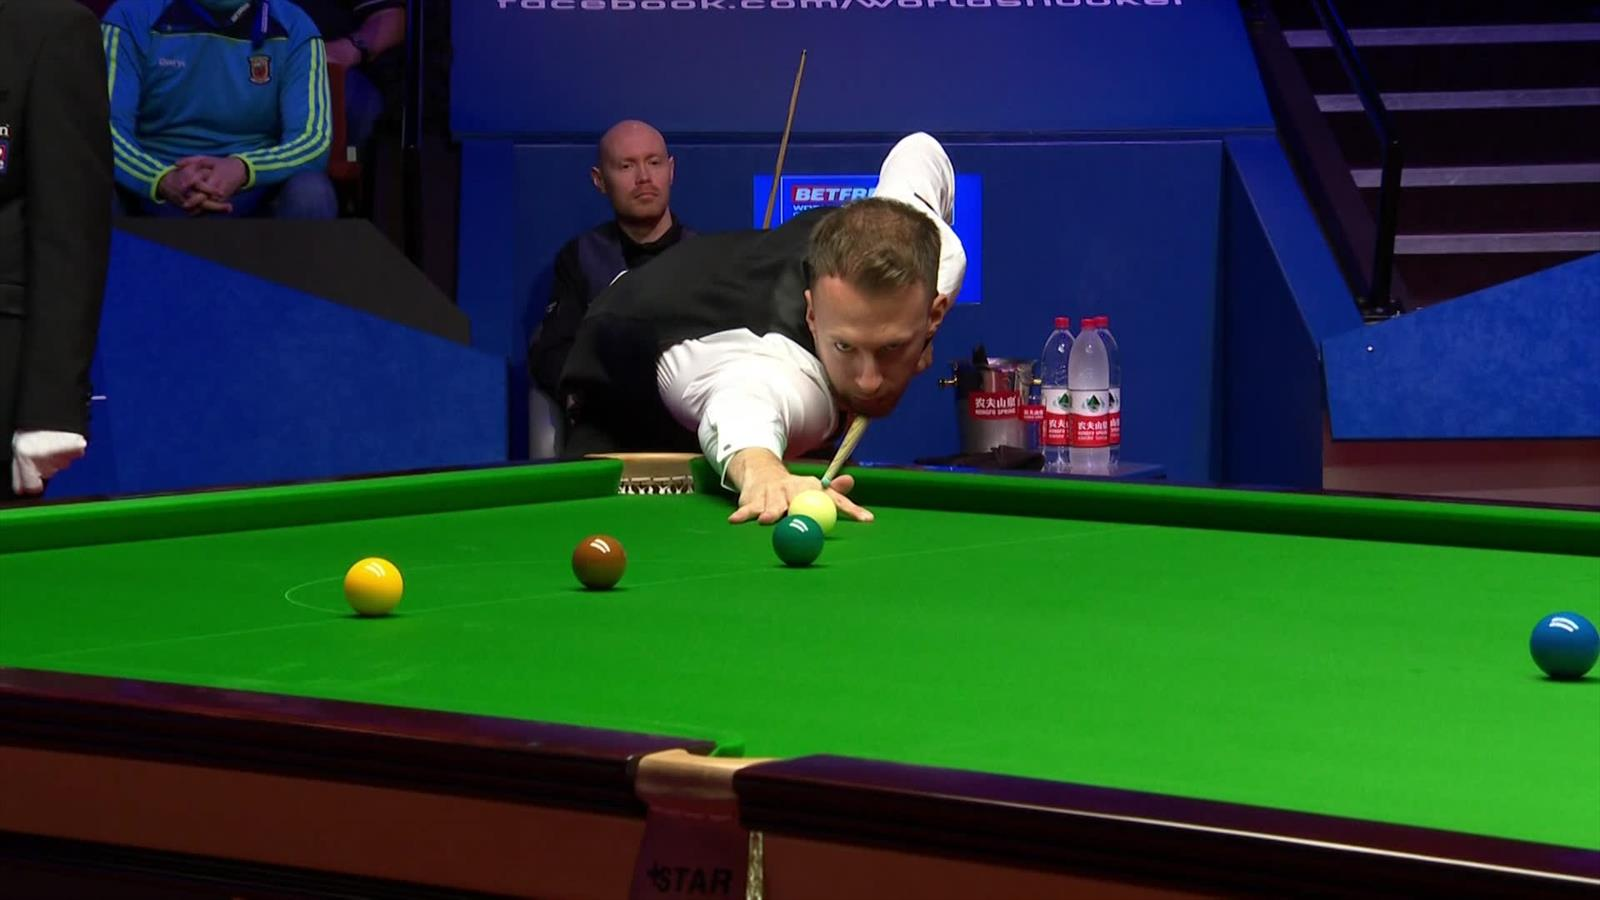 Weltrangliste Snooker 2020